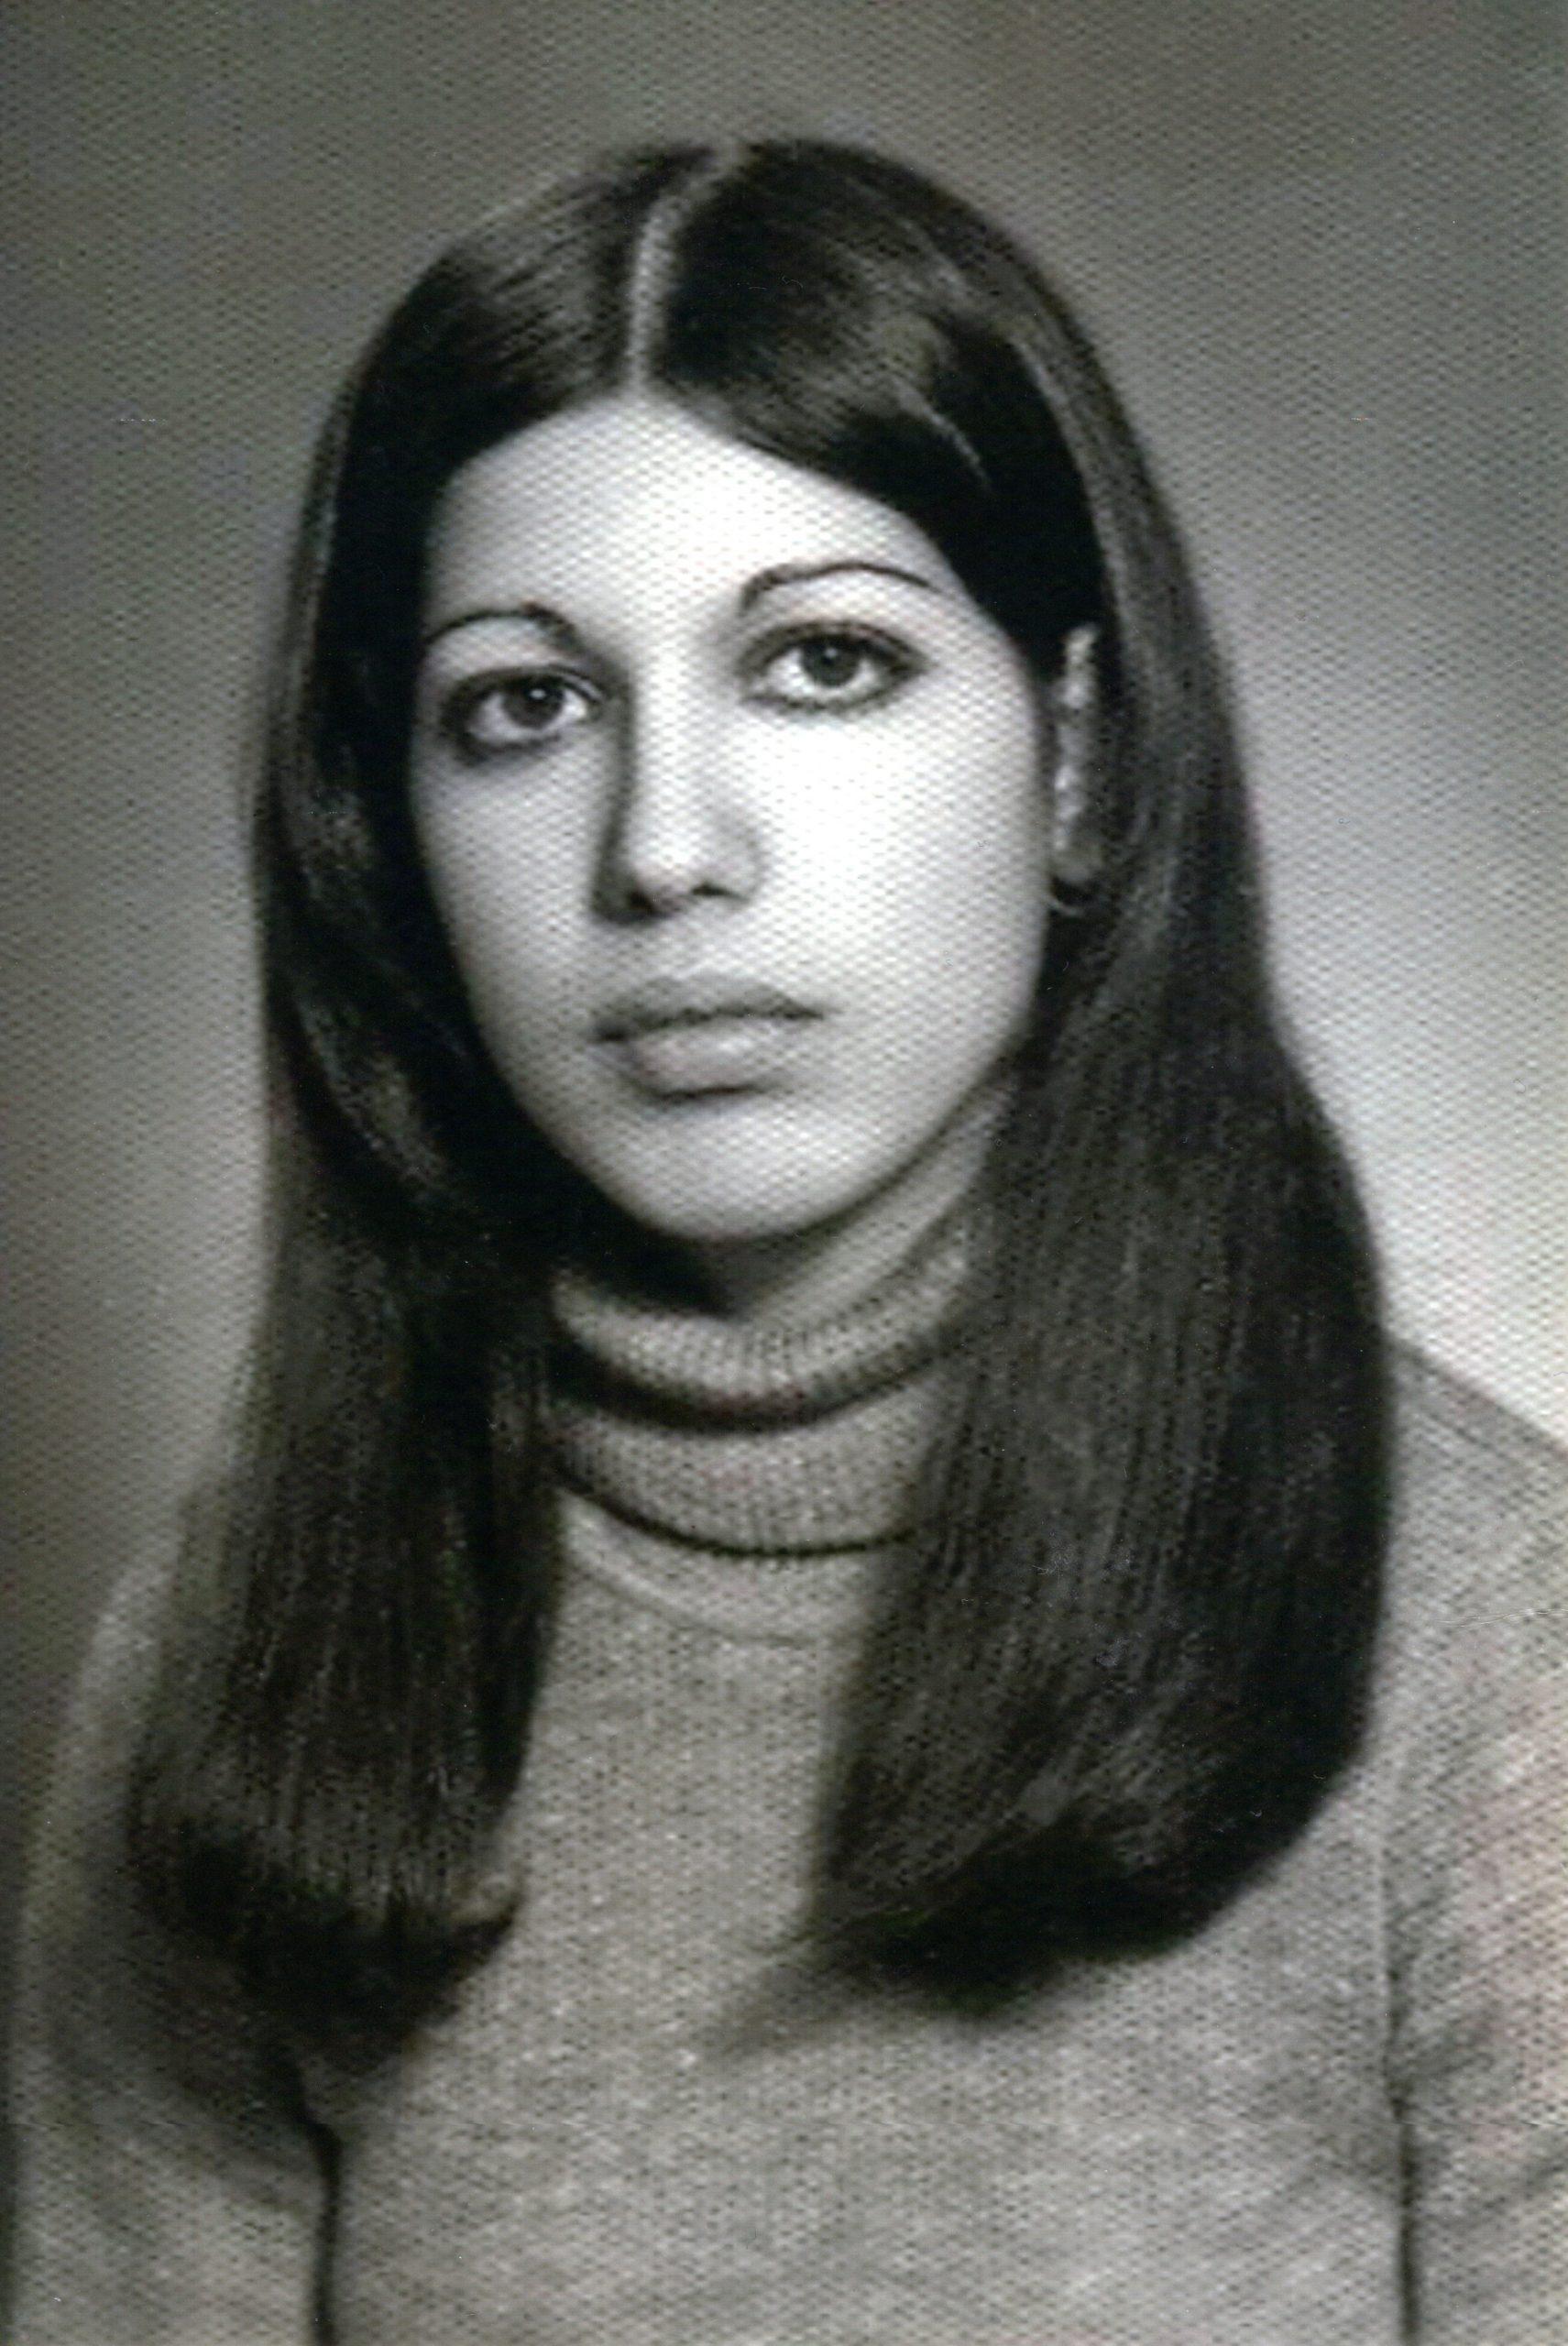 Black and white photo of pretty girl